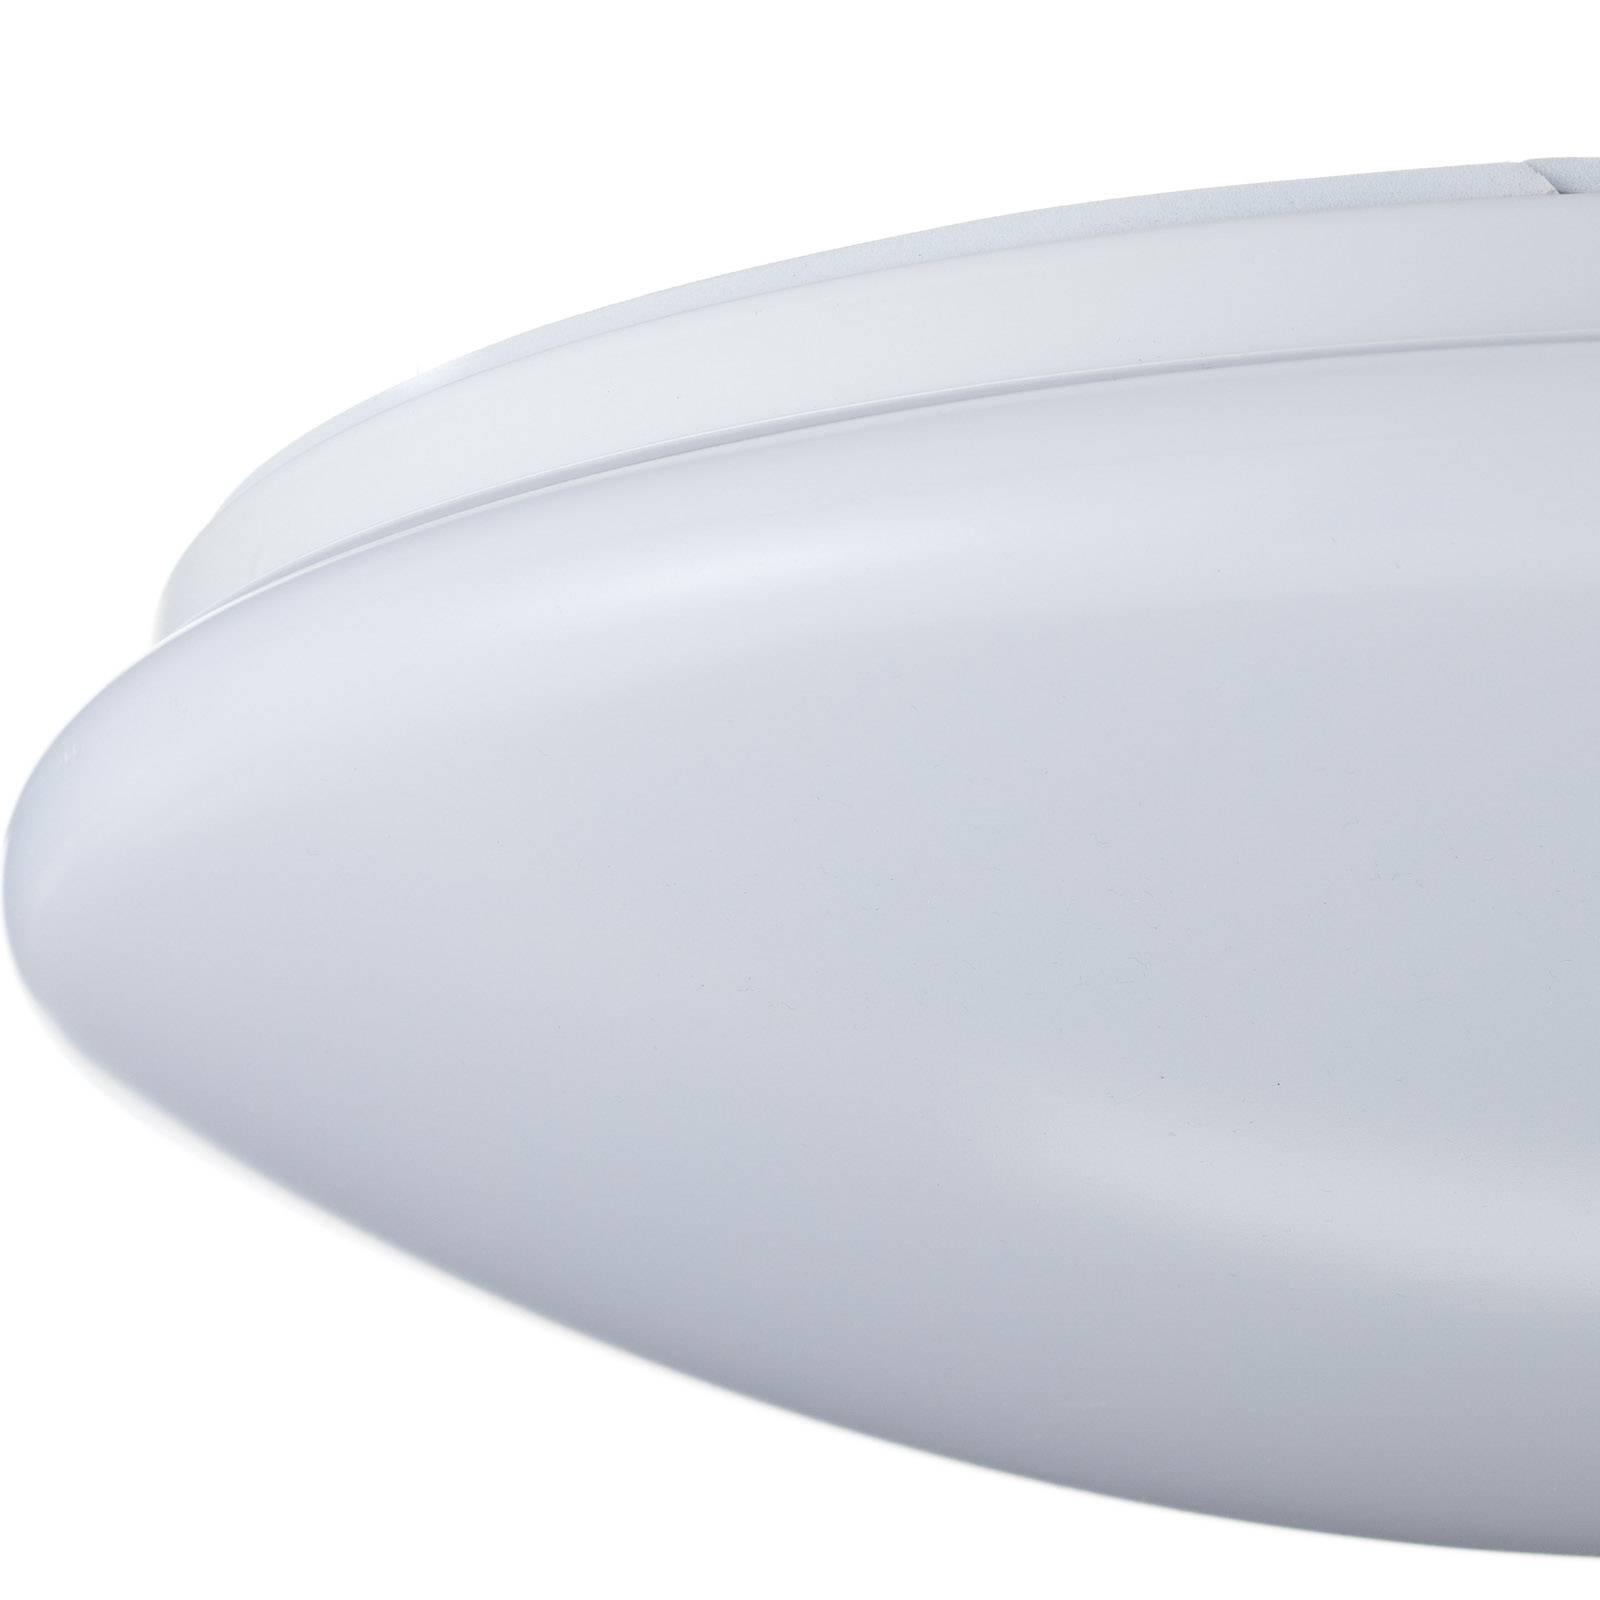 LED plafondlamp Altona LW3, warmwit Ø 38,5 cm